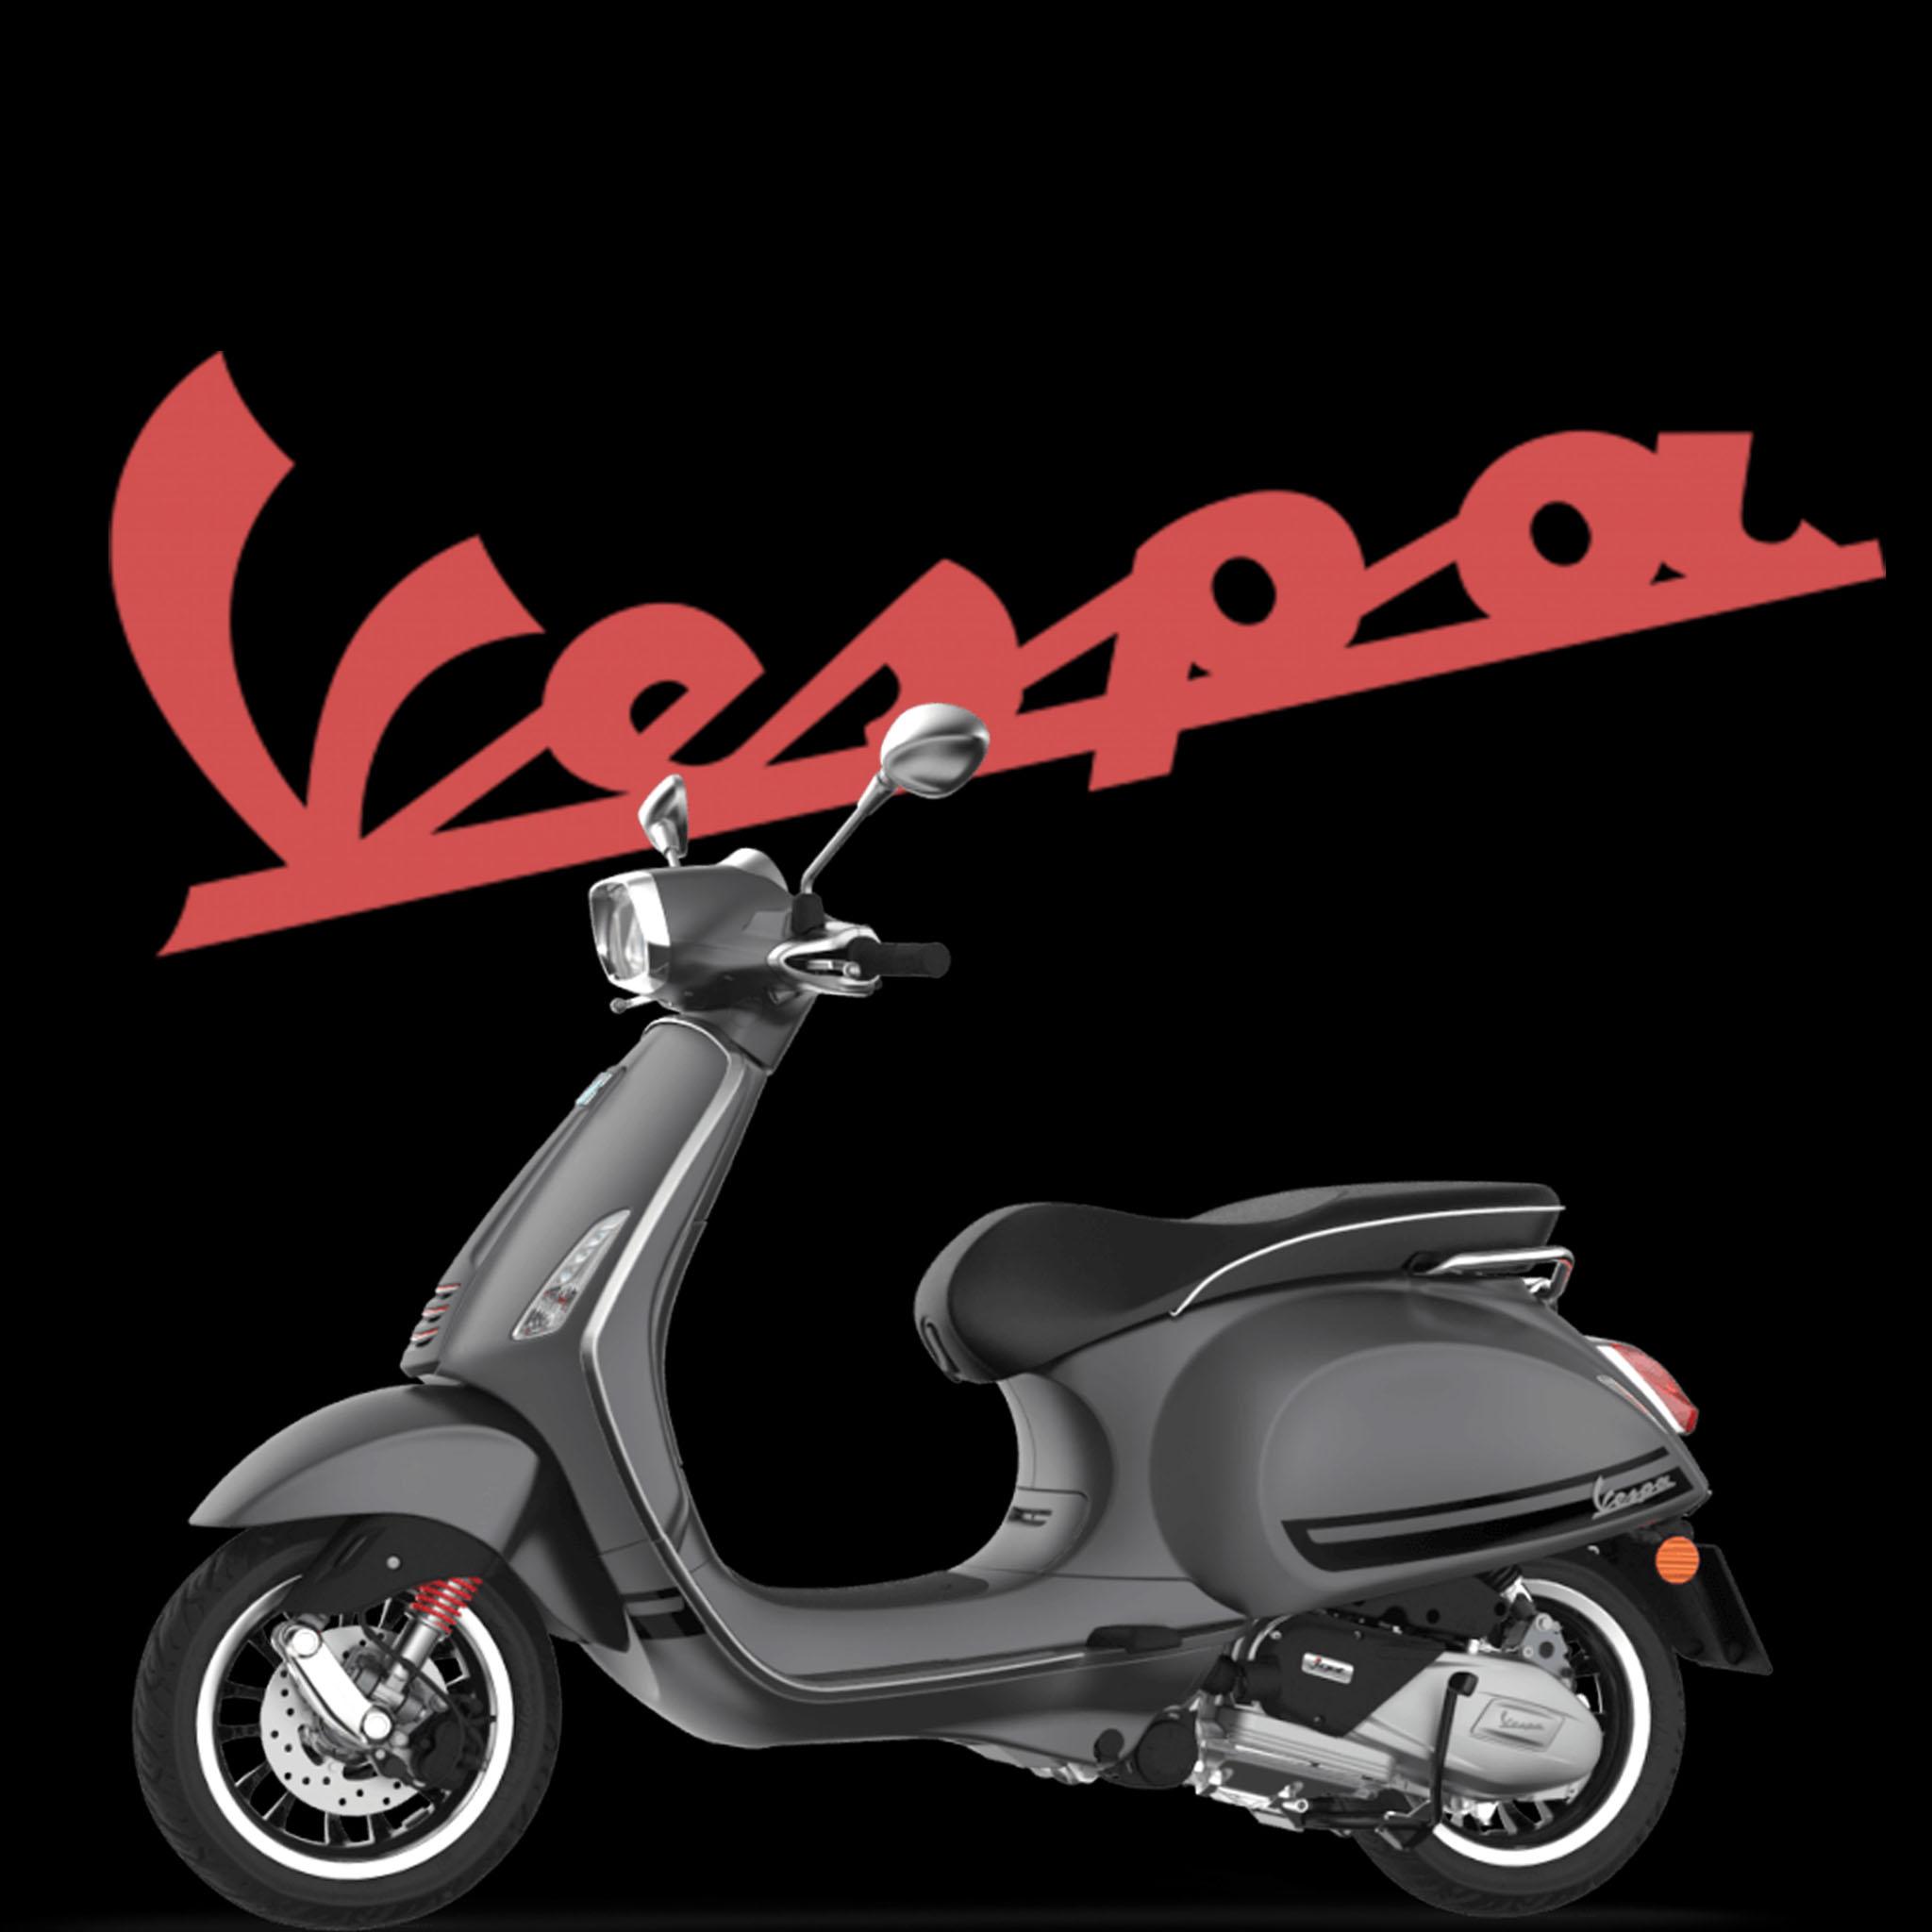 Vespa1 - 2 Rad Tesar